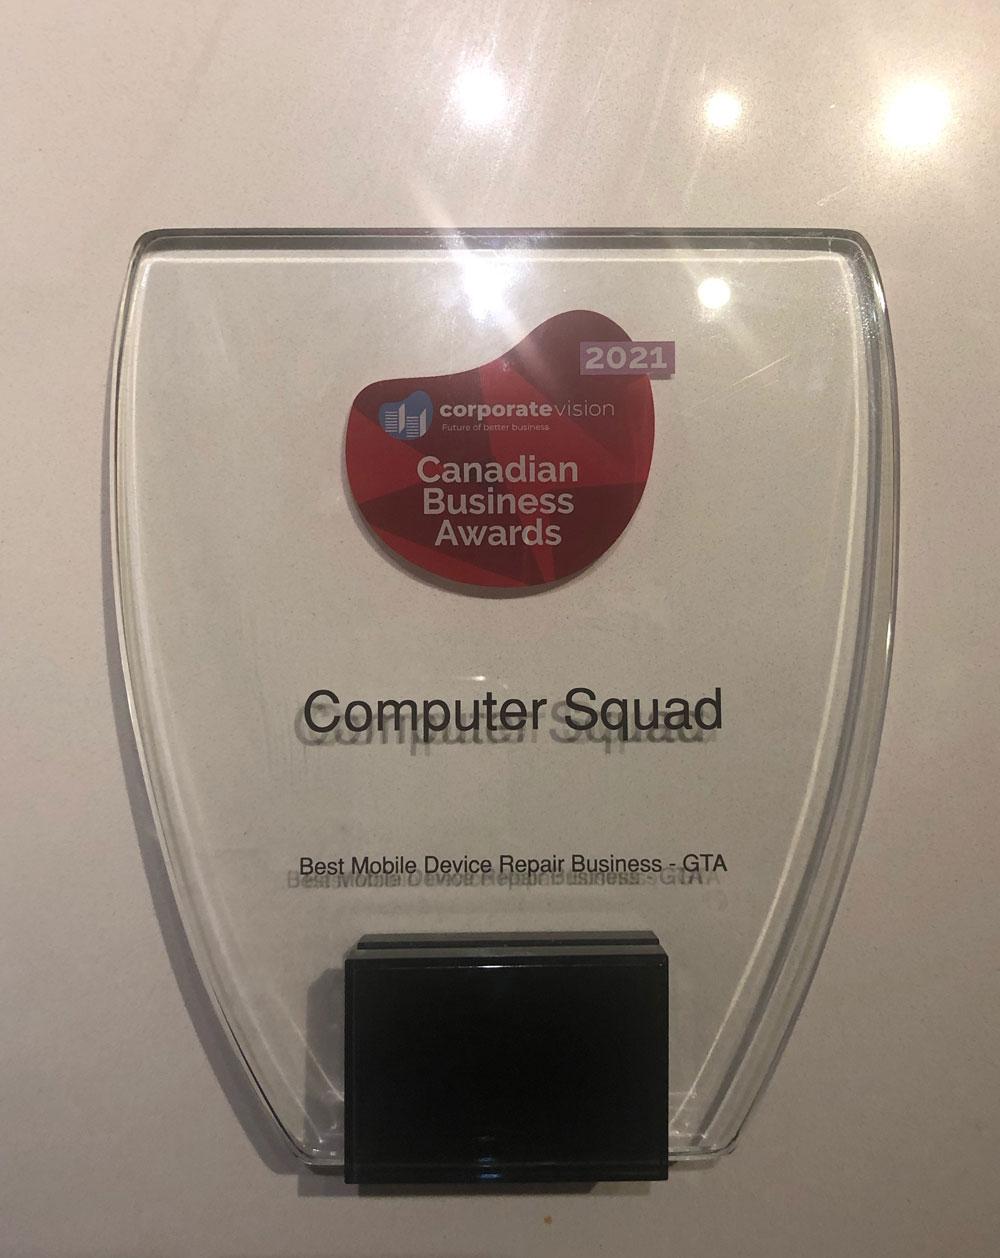 2021 Canadian Business Awards